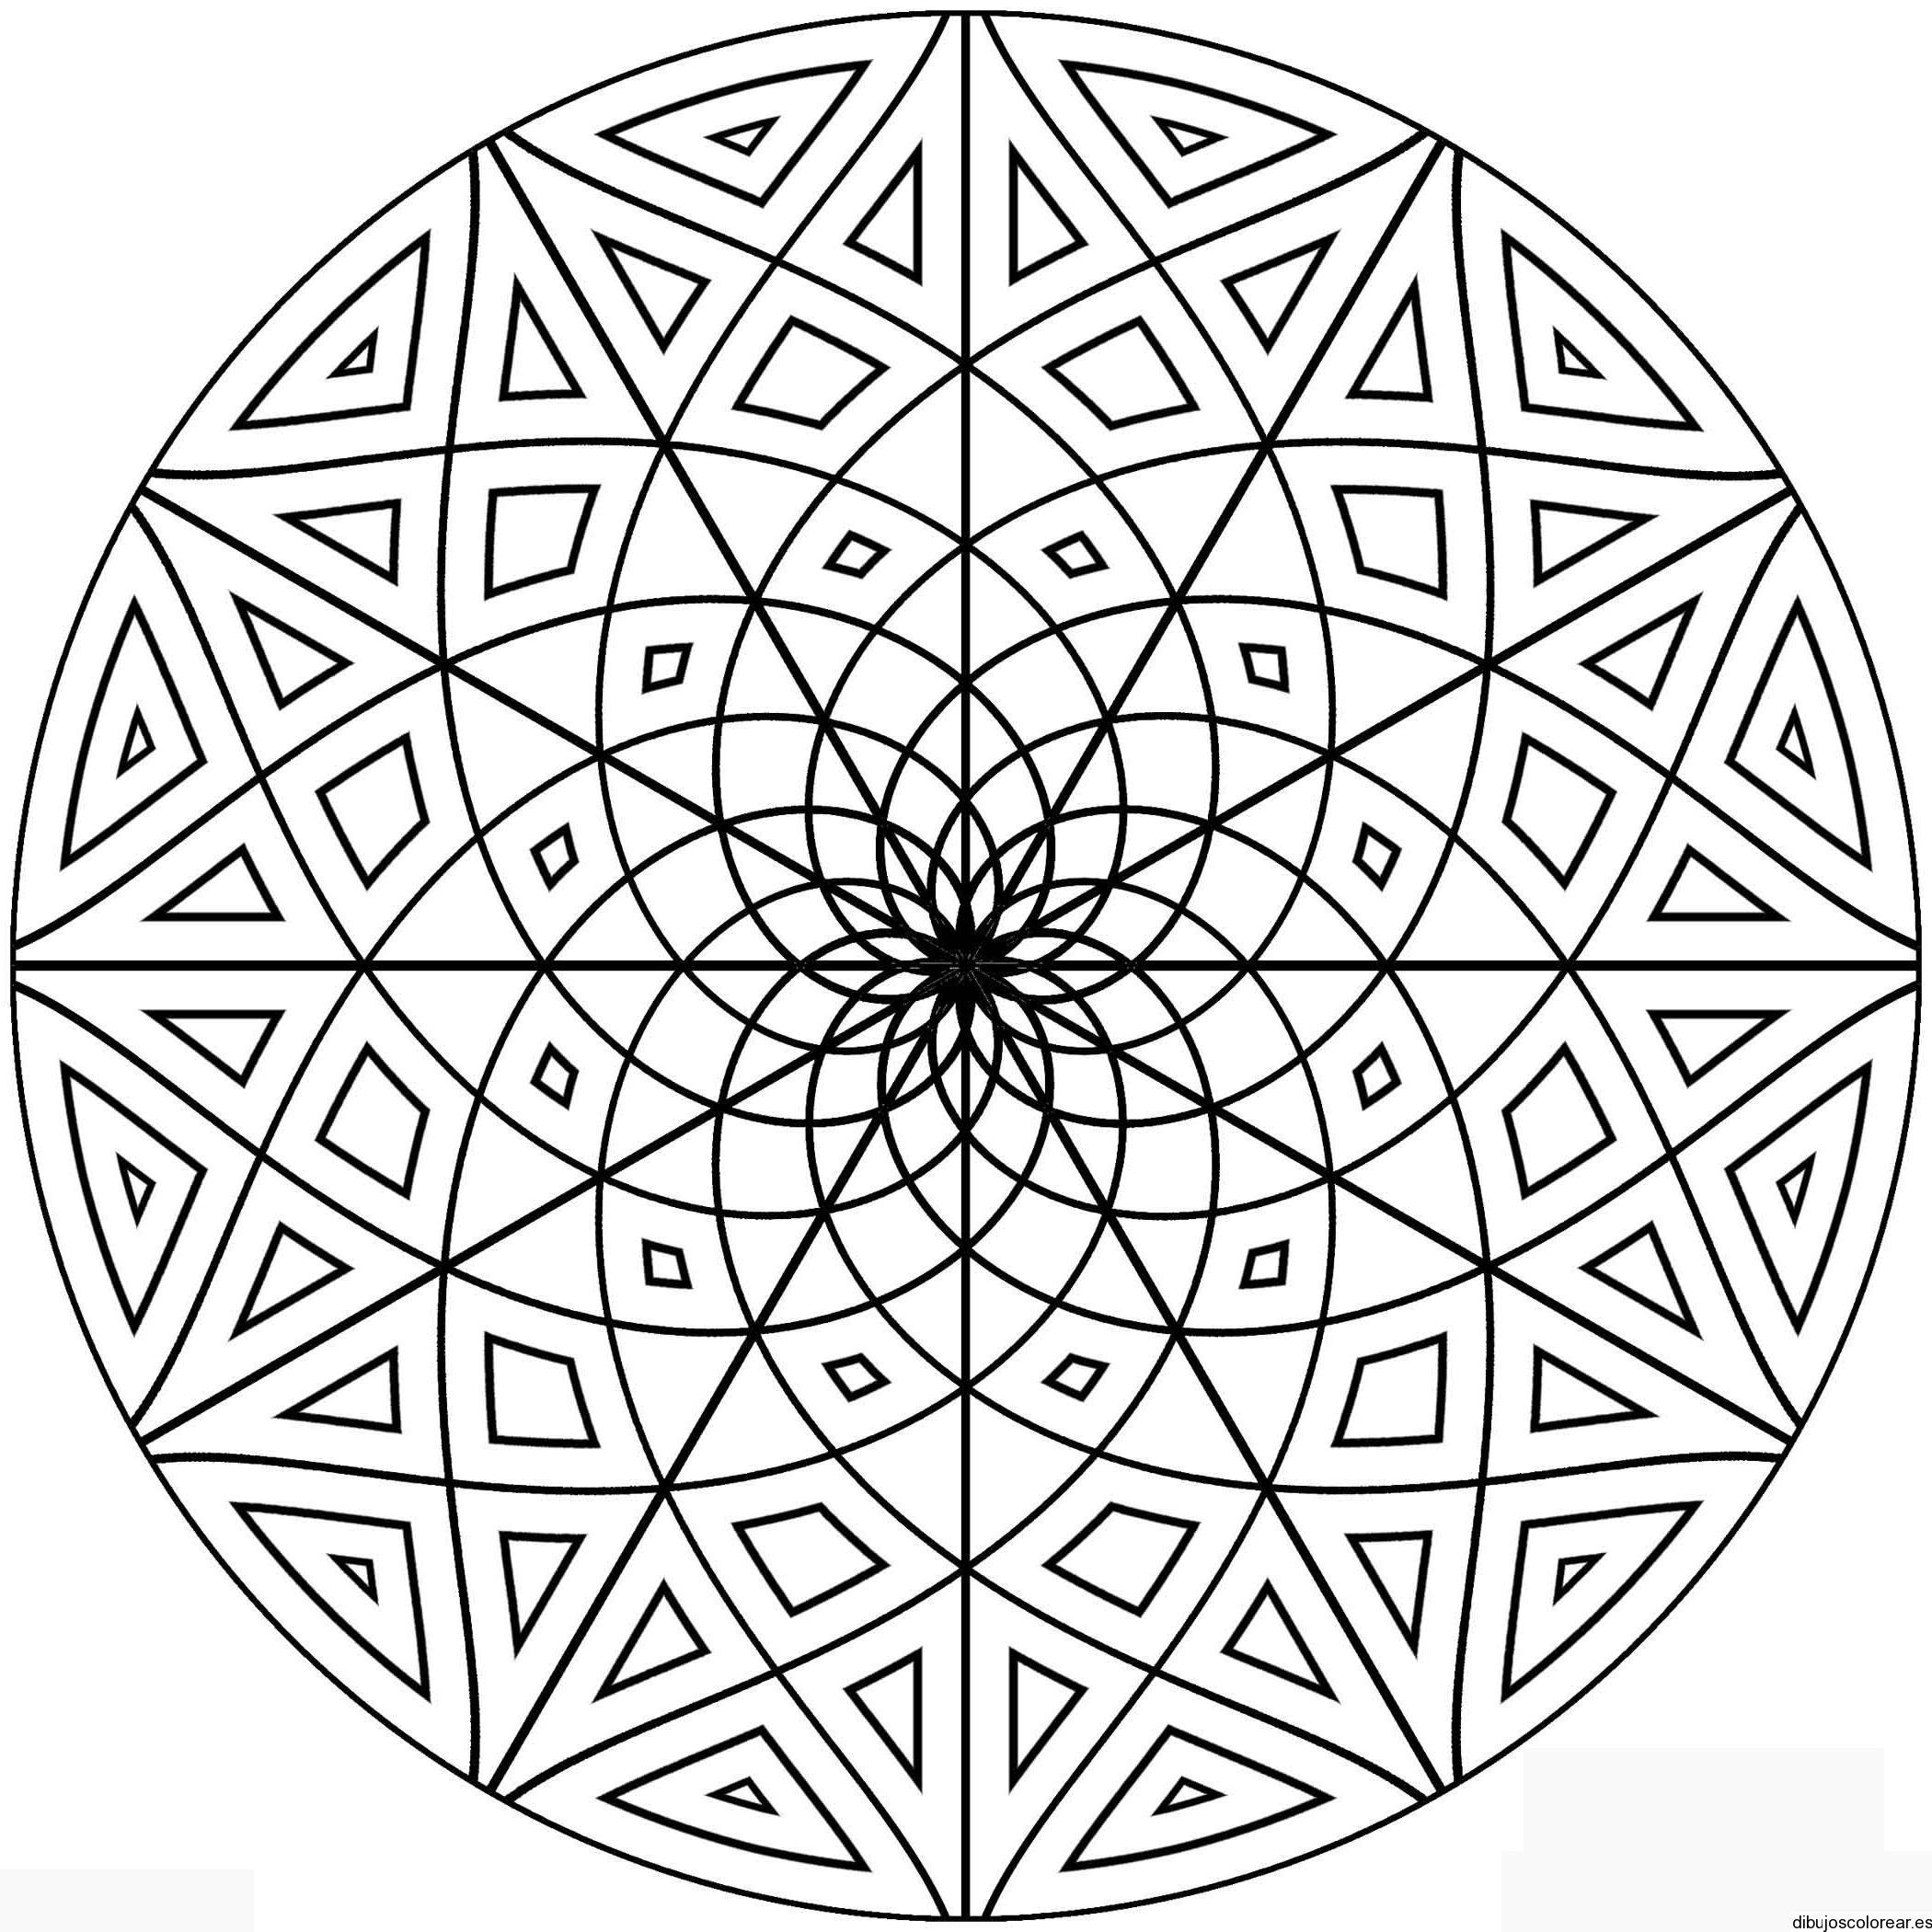 Esfera con figuras geométricas | Ideas de Diseño | Pinterest ...